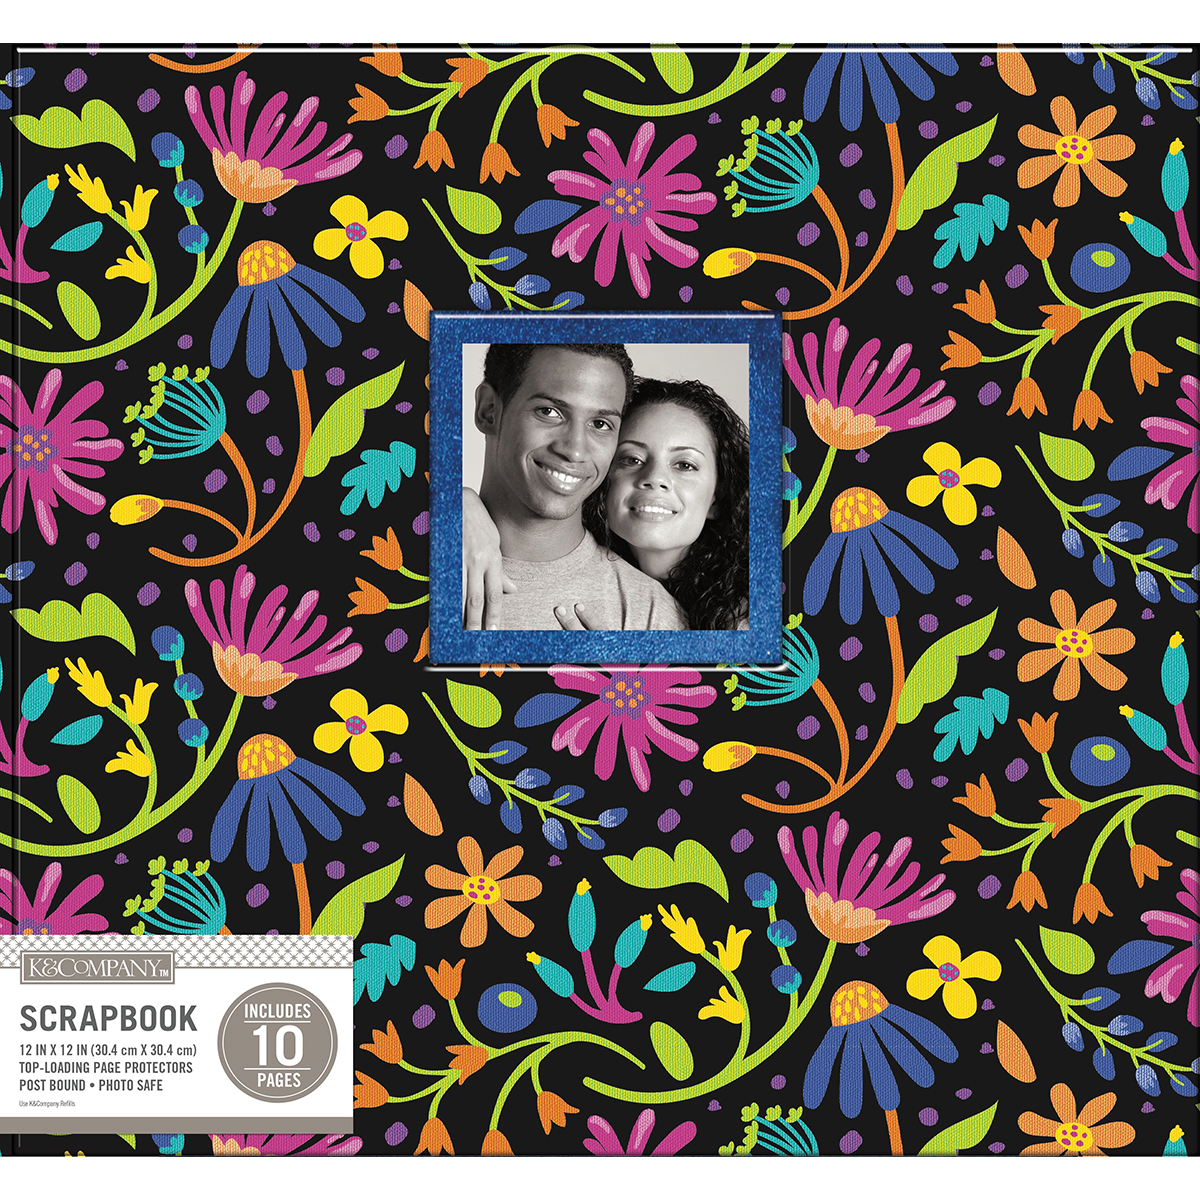 K&Company Post Bound Window Album 12X12-Black Floral W/Glitter